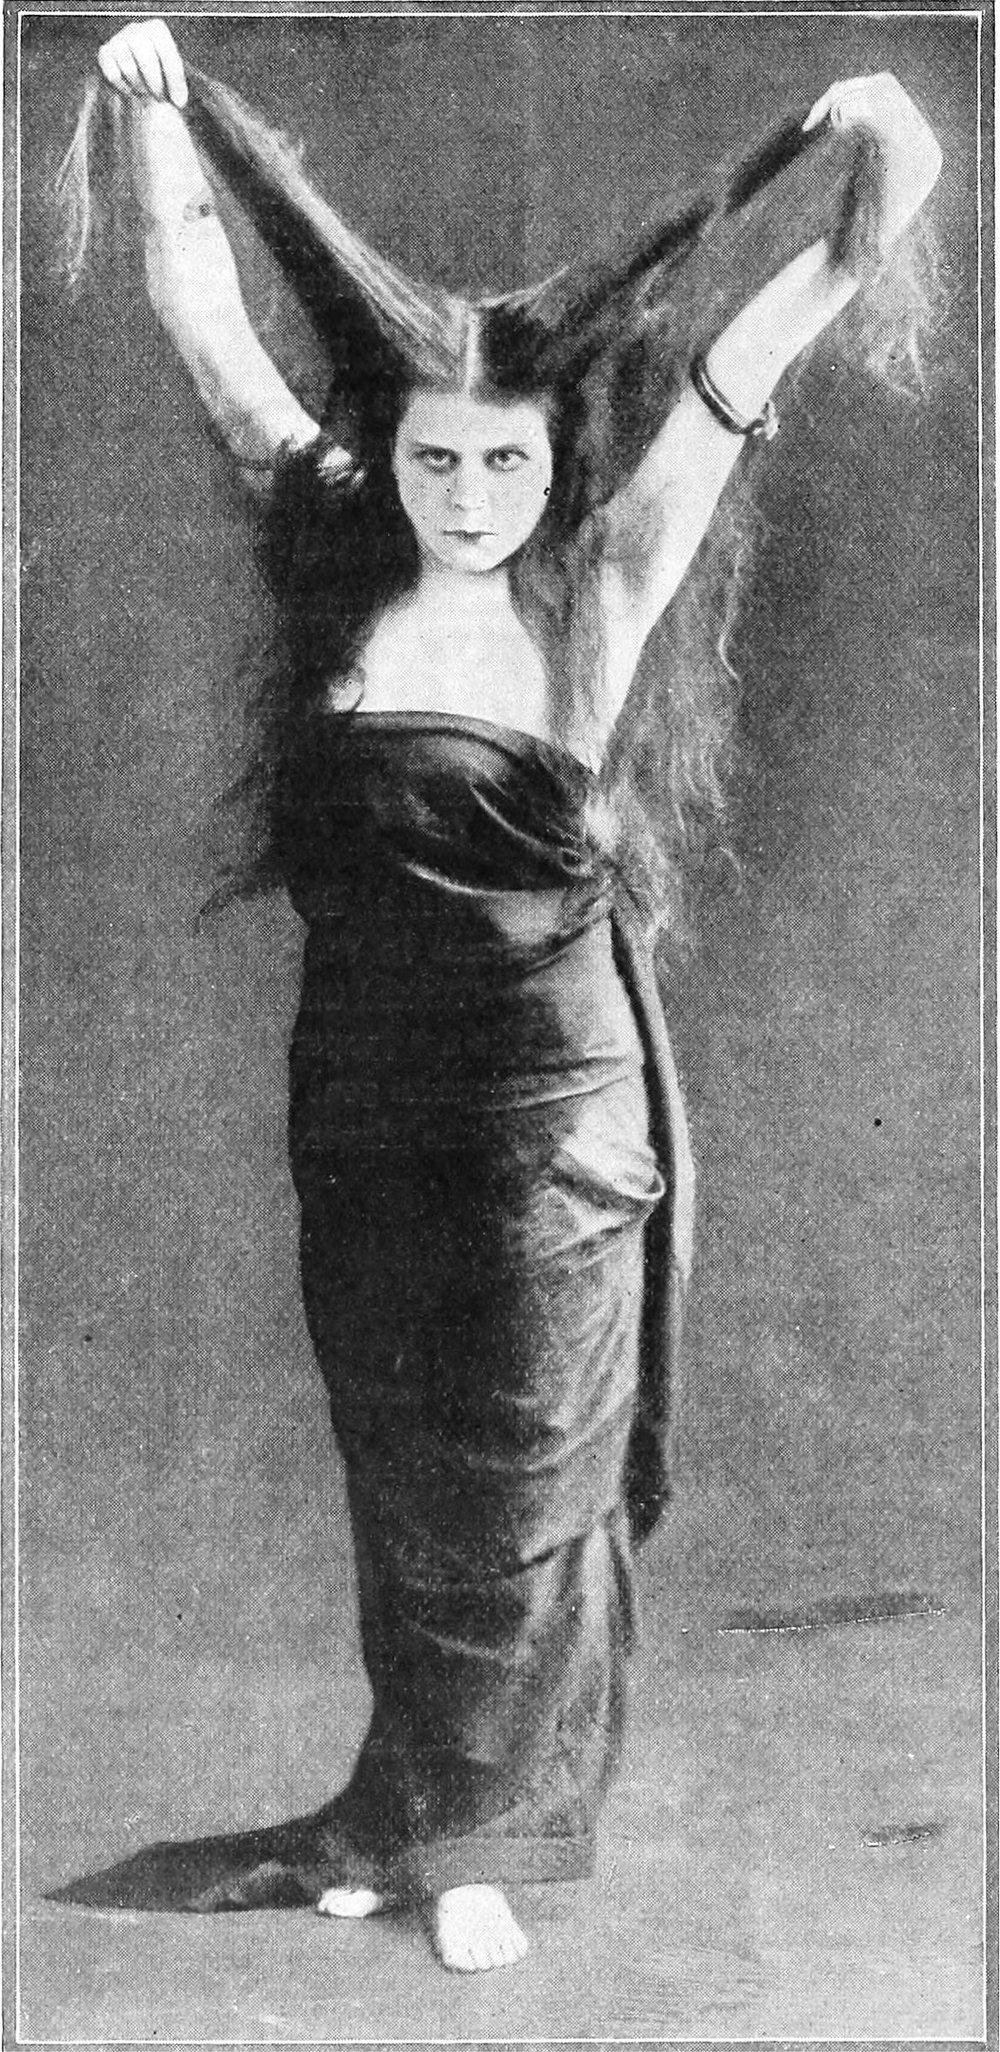 Theda_Bara_in_vampire_pose,_1918.jpg